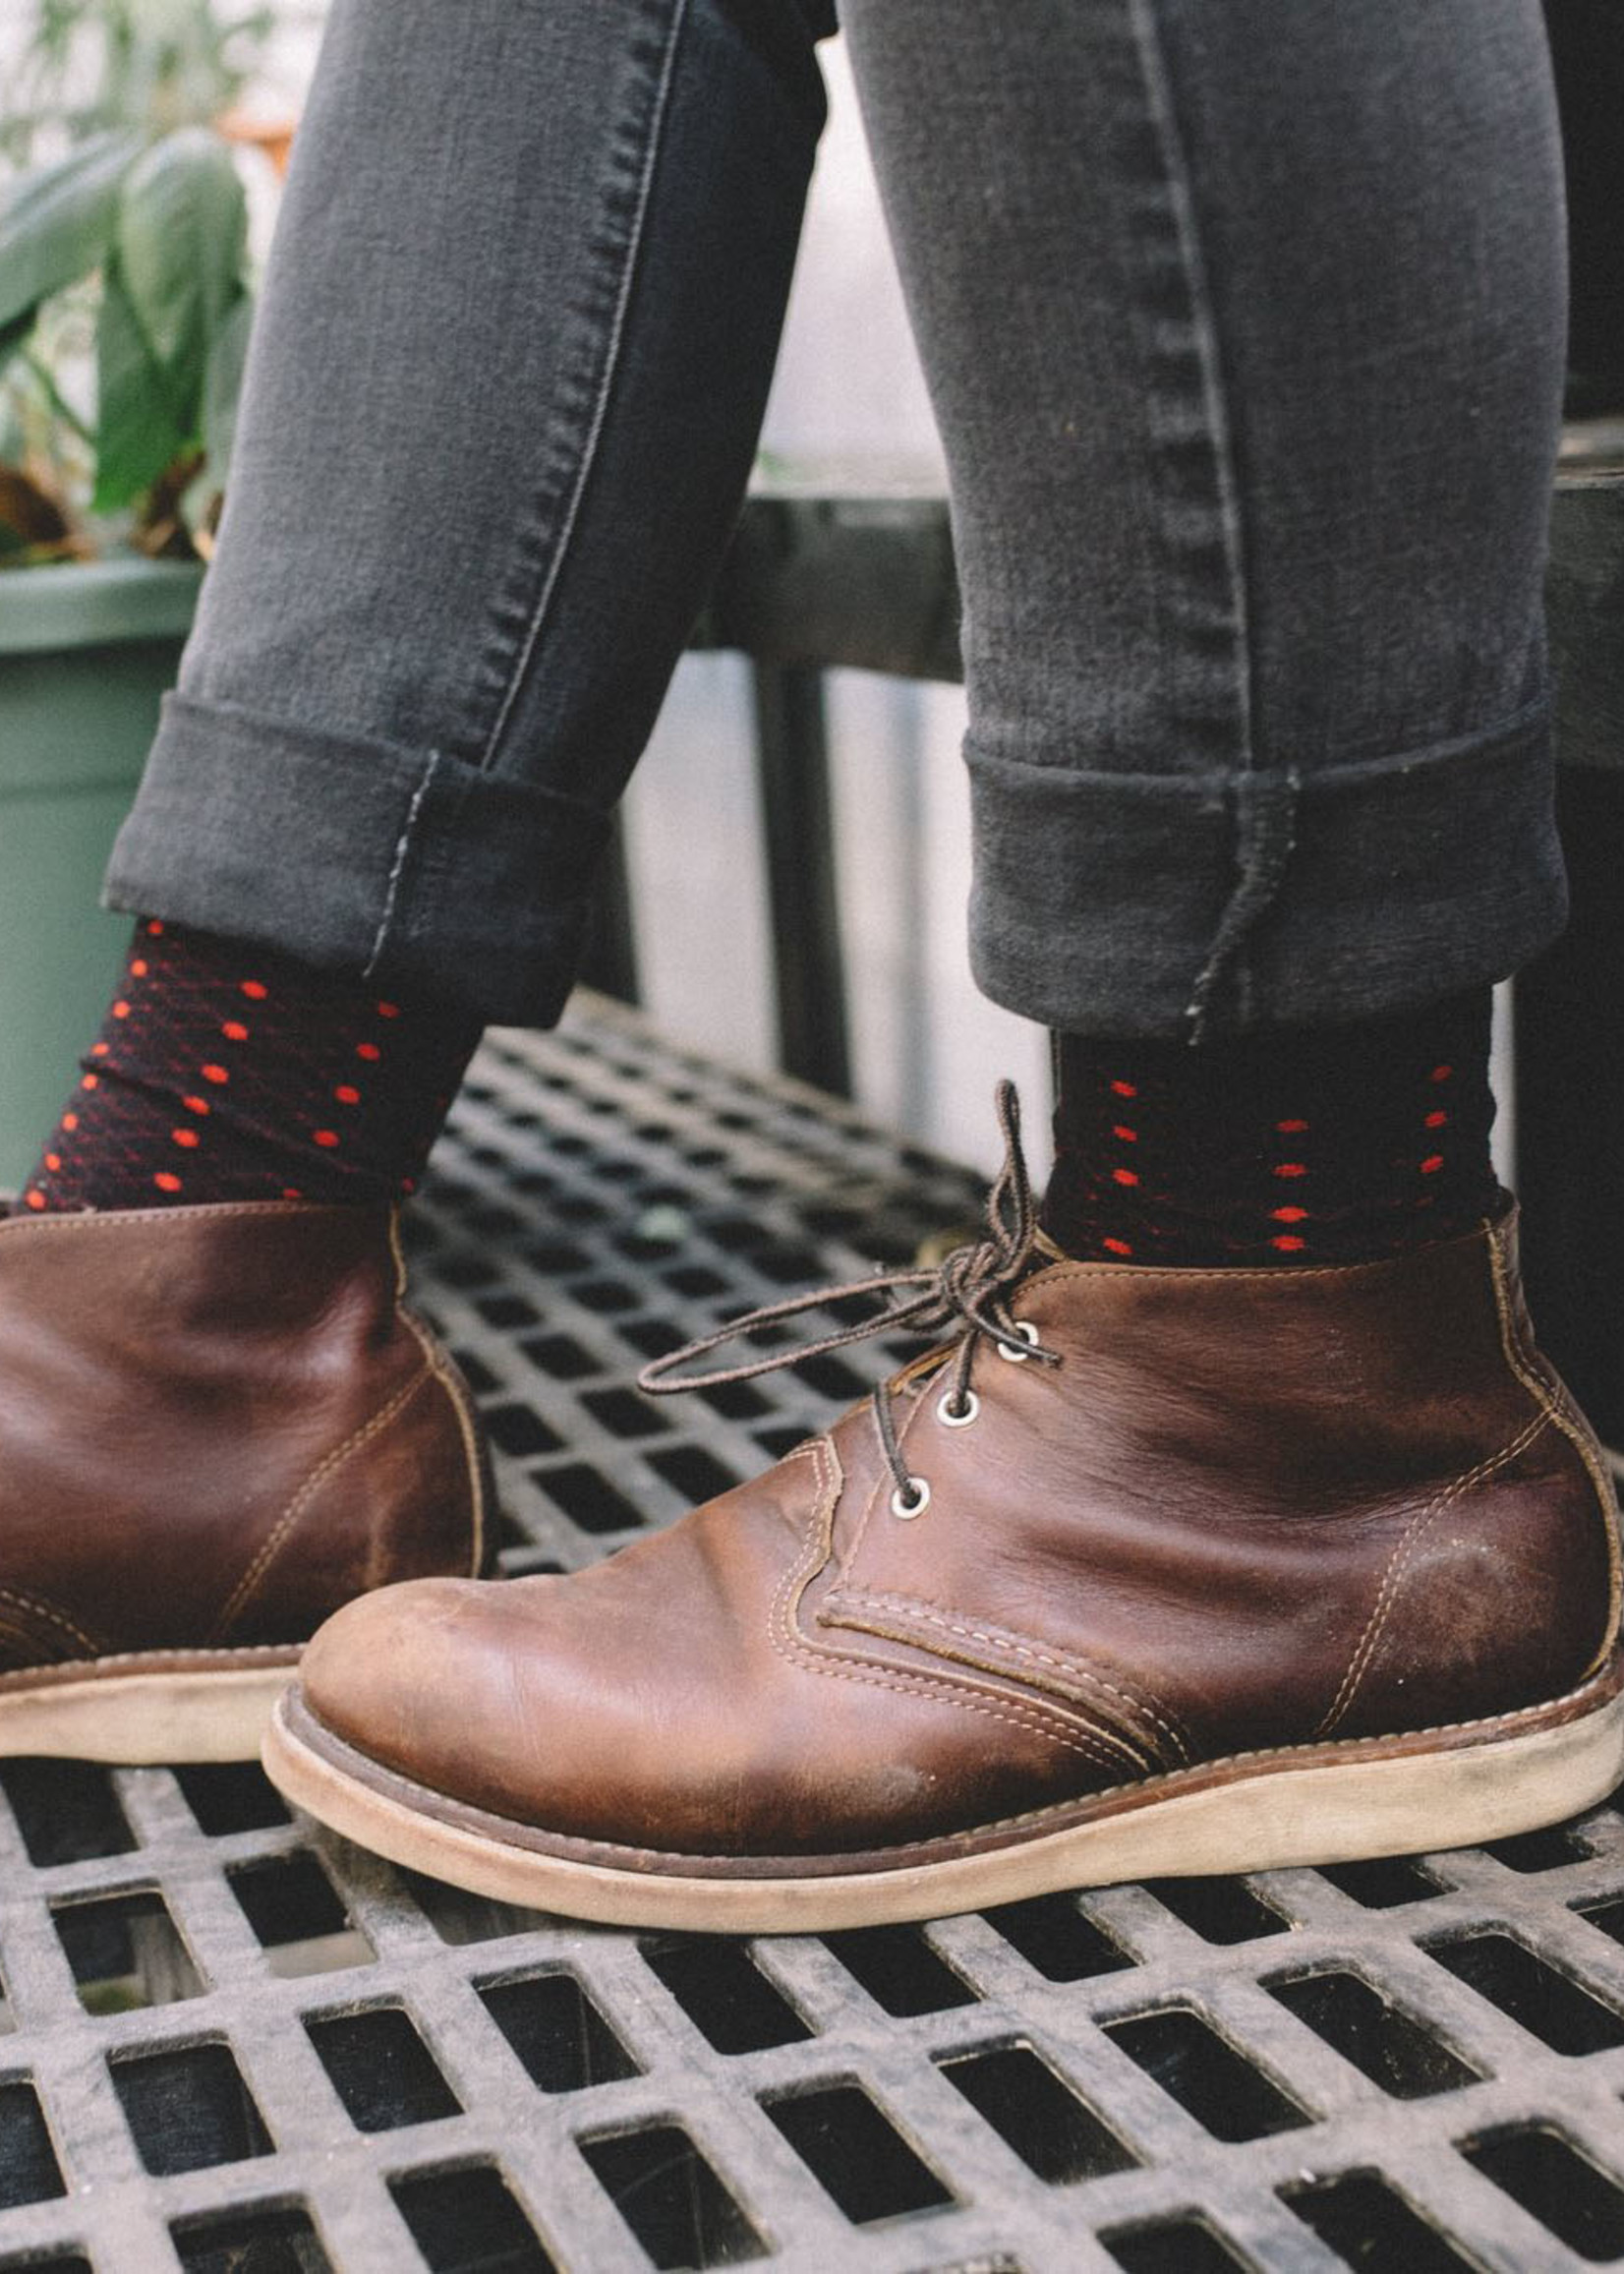 Conscious Step Women's Socks That Provide HIV Treatments [black]